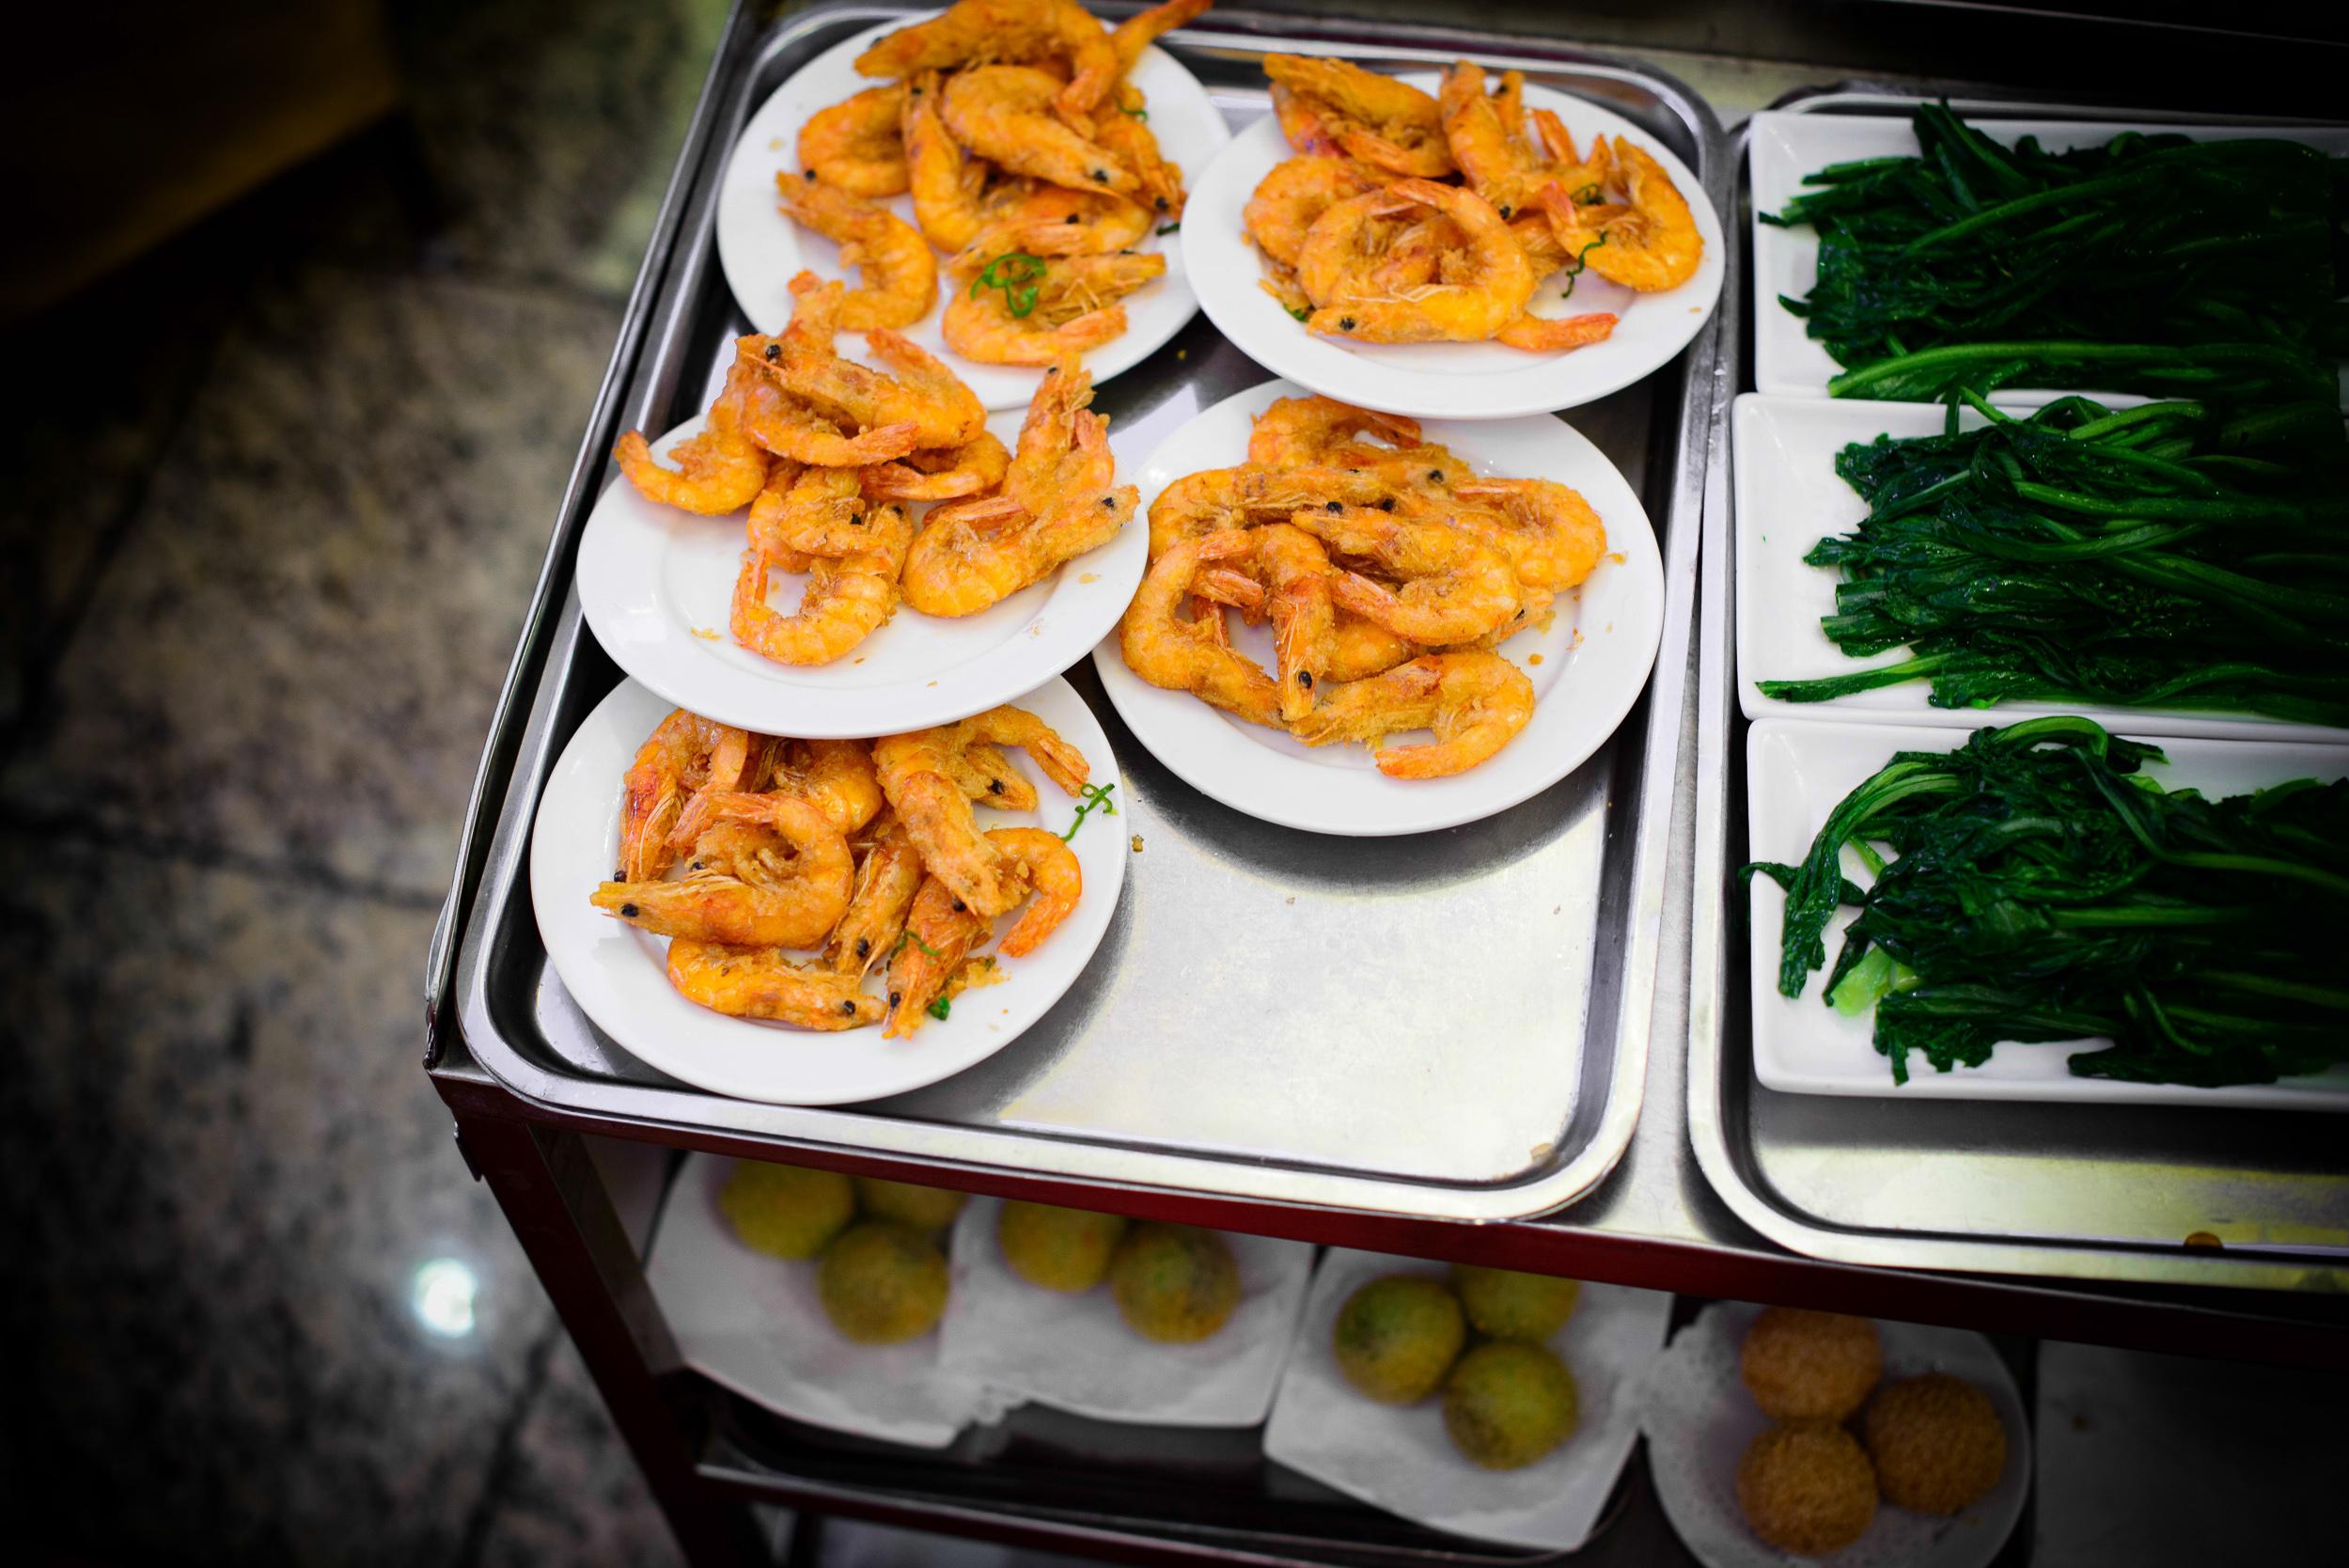 Deep-fried shrimp, Chinese broccoli, pork buns